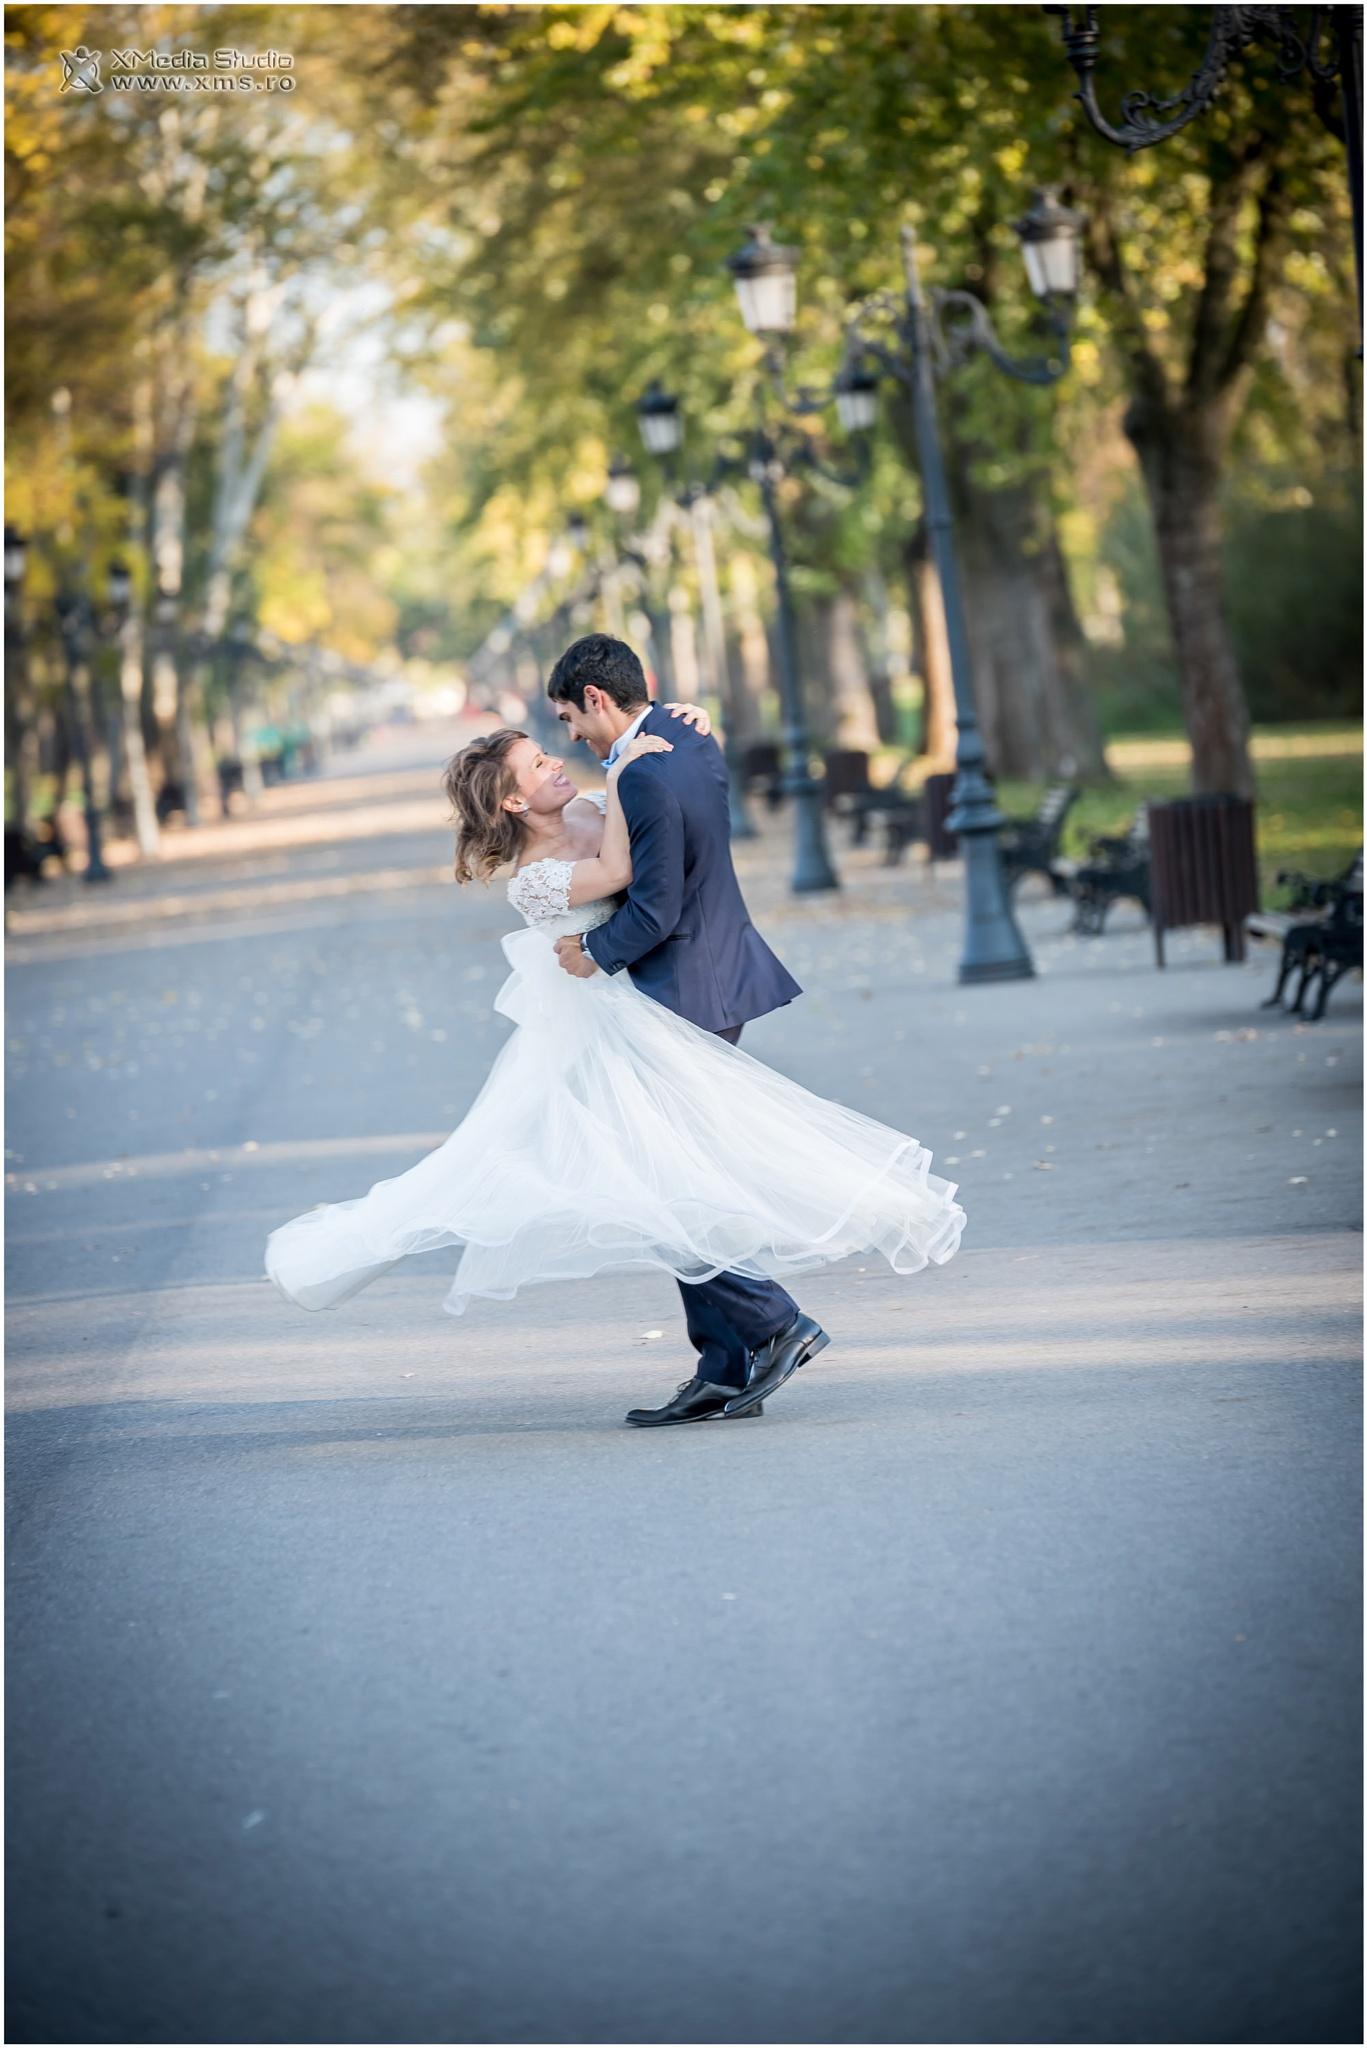 Wedding photography by Xmediastudio valentin